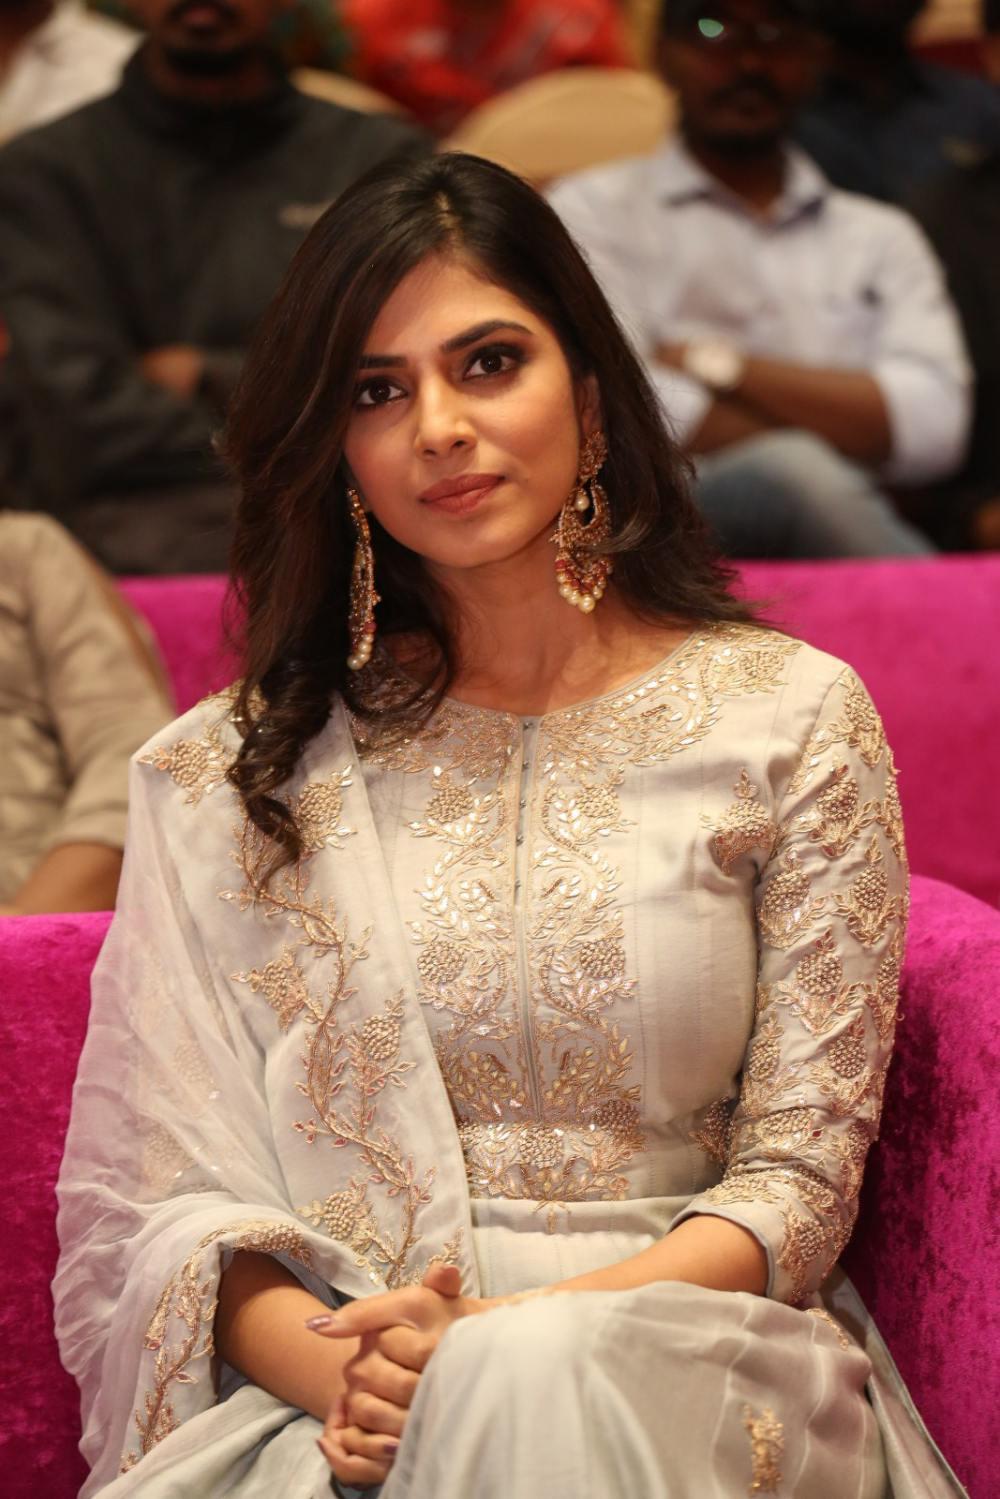 Malavika Mohanan at peta movie audio launch (3)